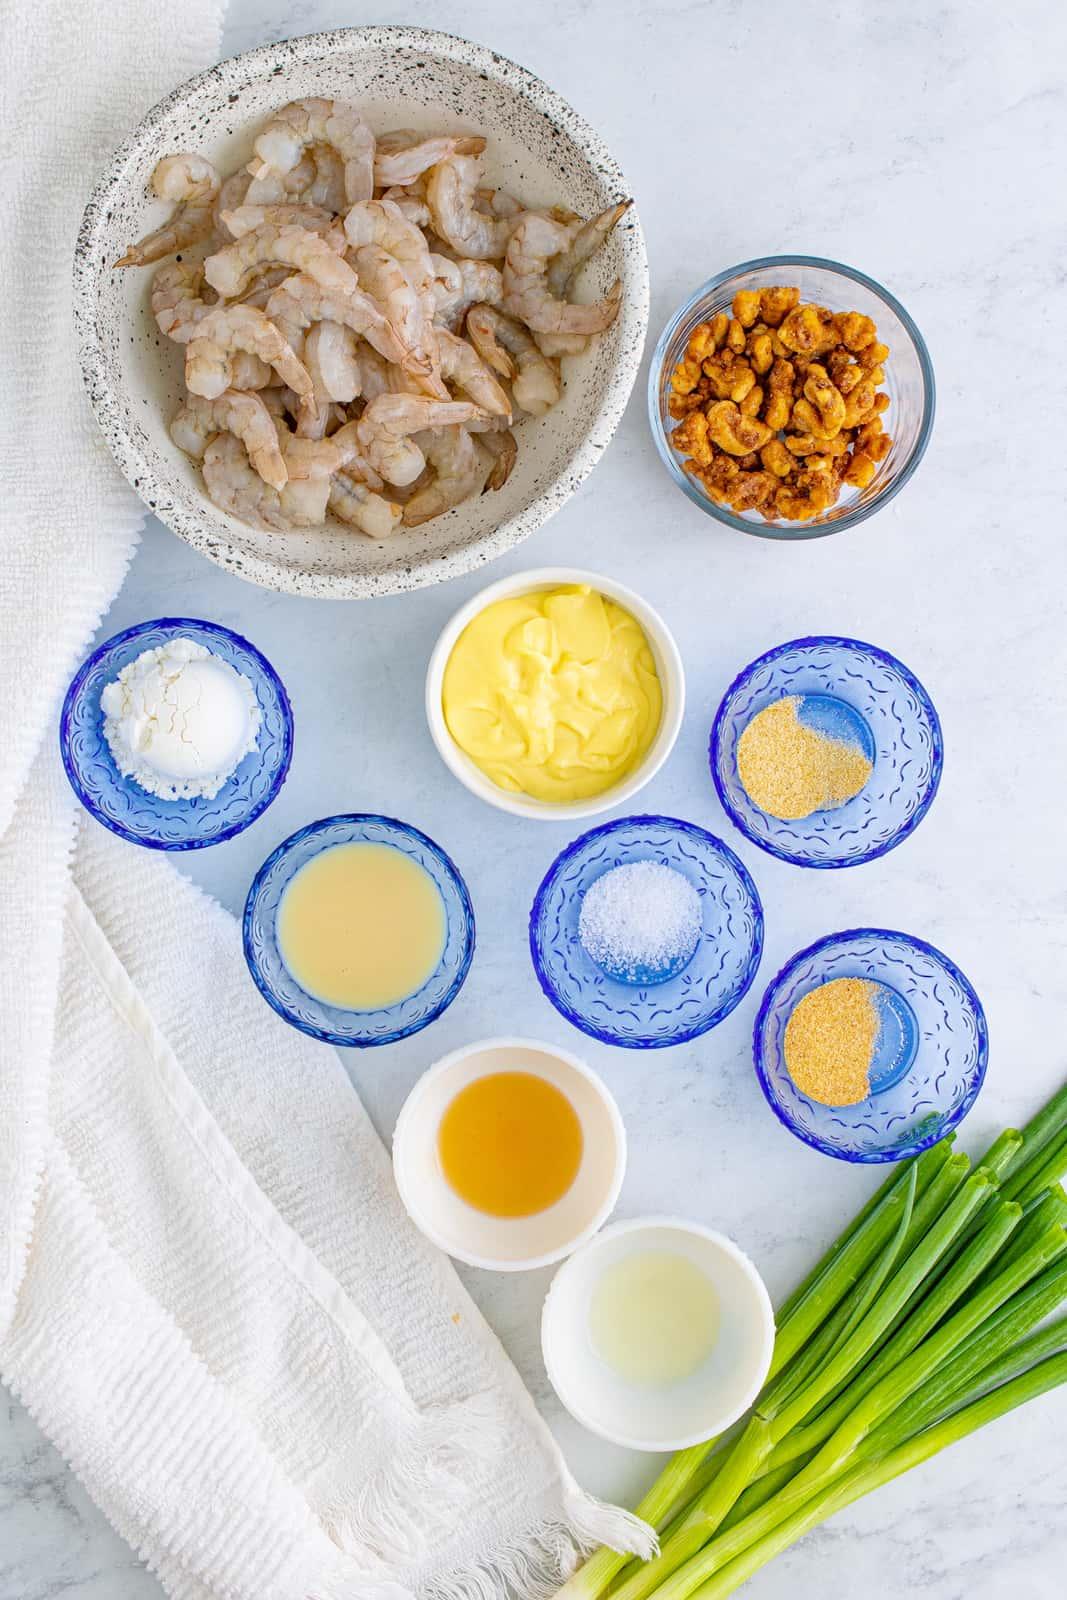 Ingredients needed for Honey Walnut Shrimp